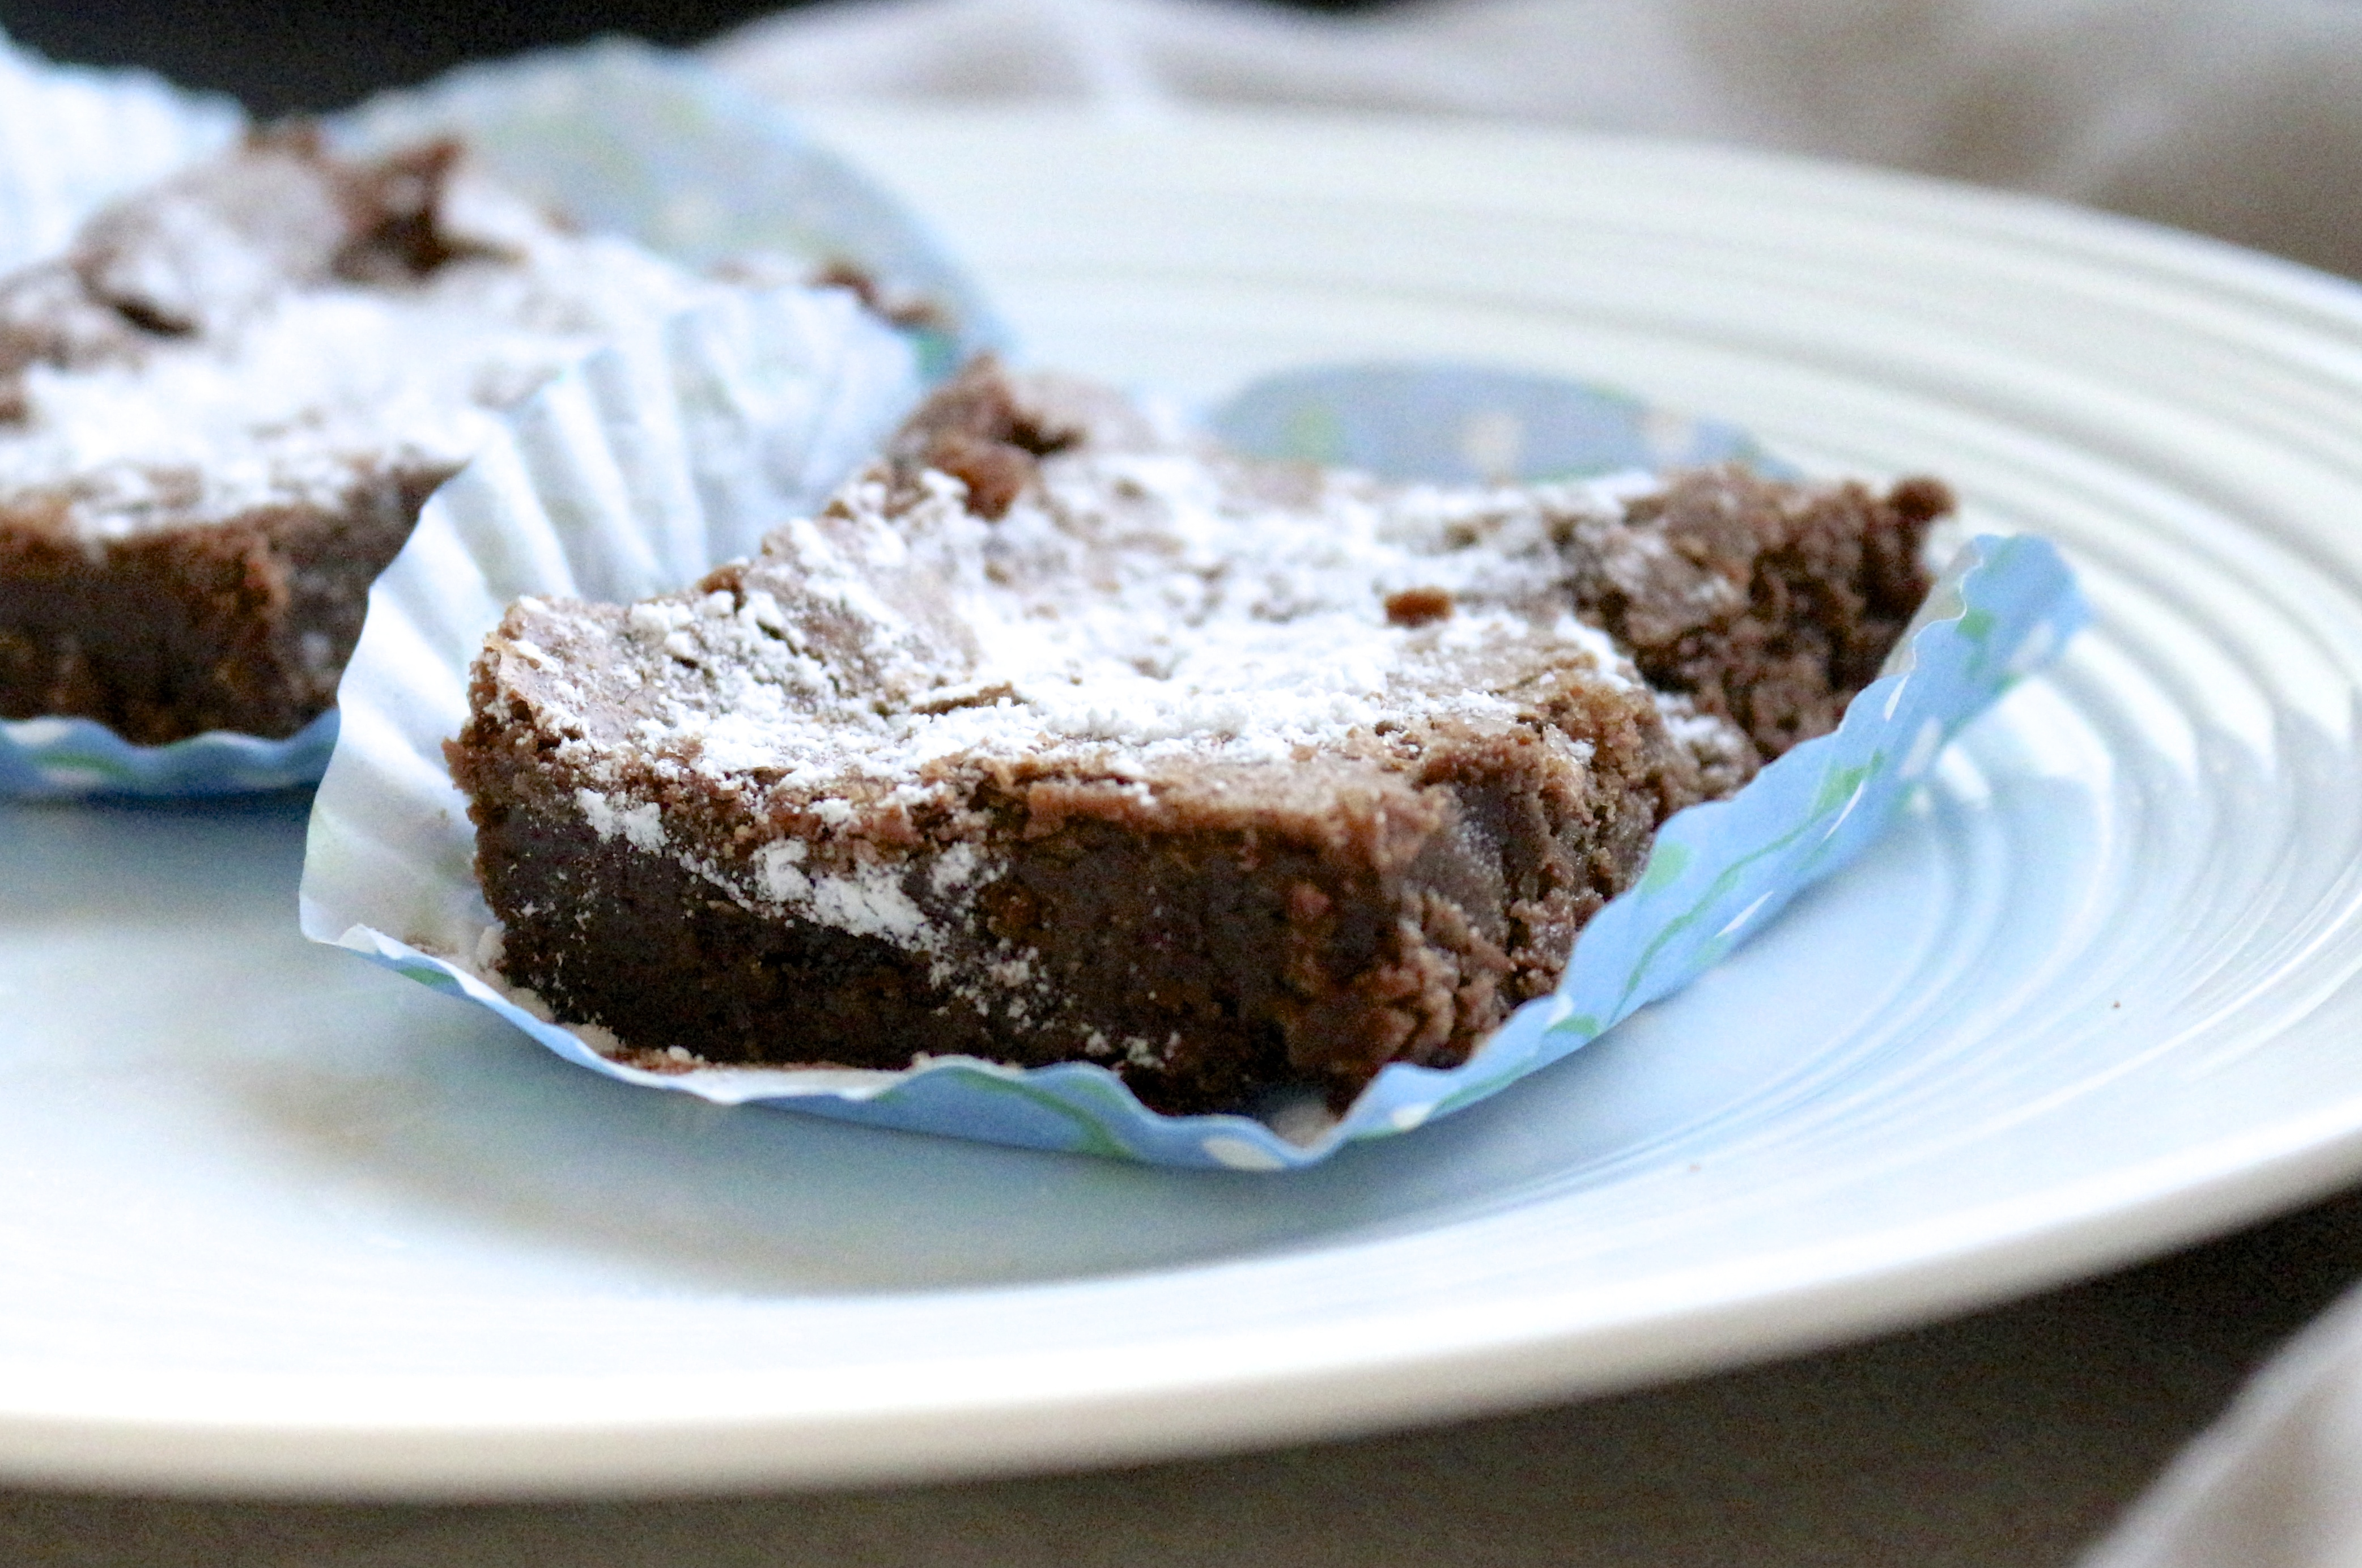 Recette originale du brownie - Sweet Cabane